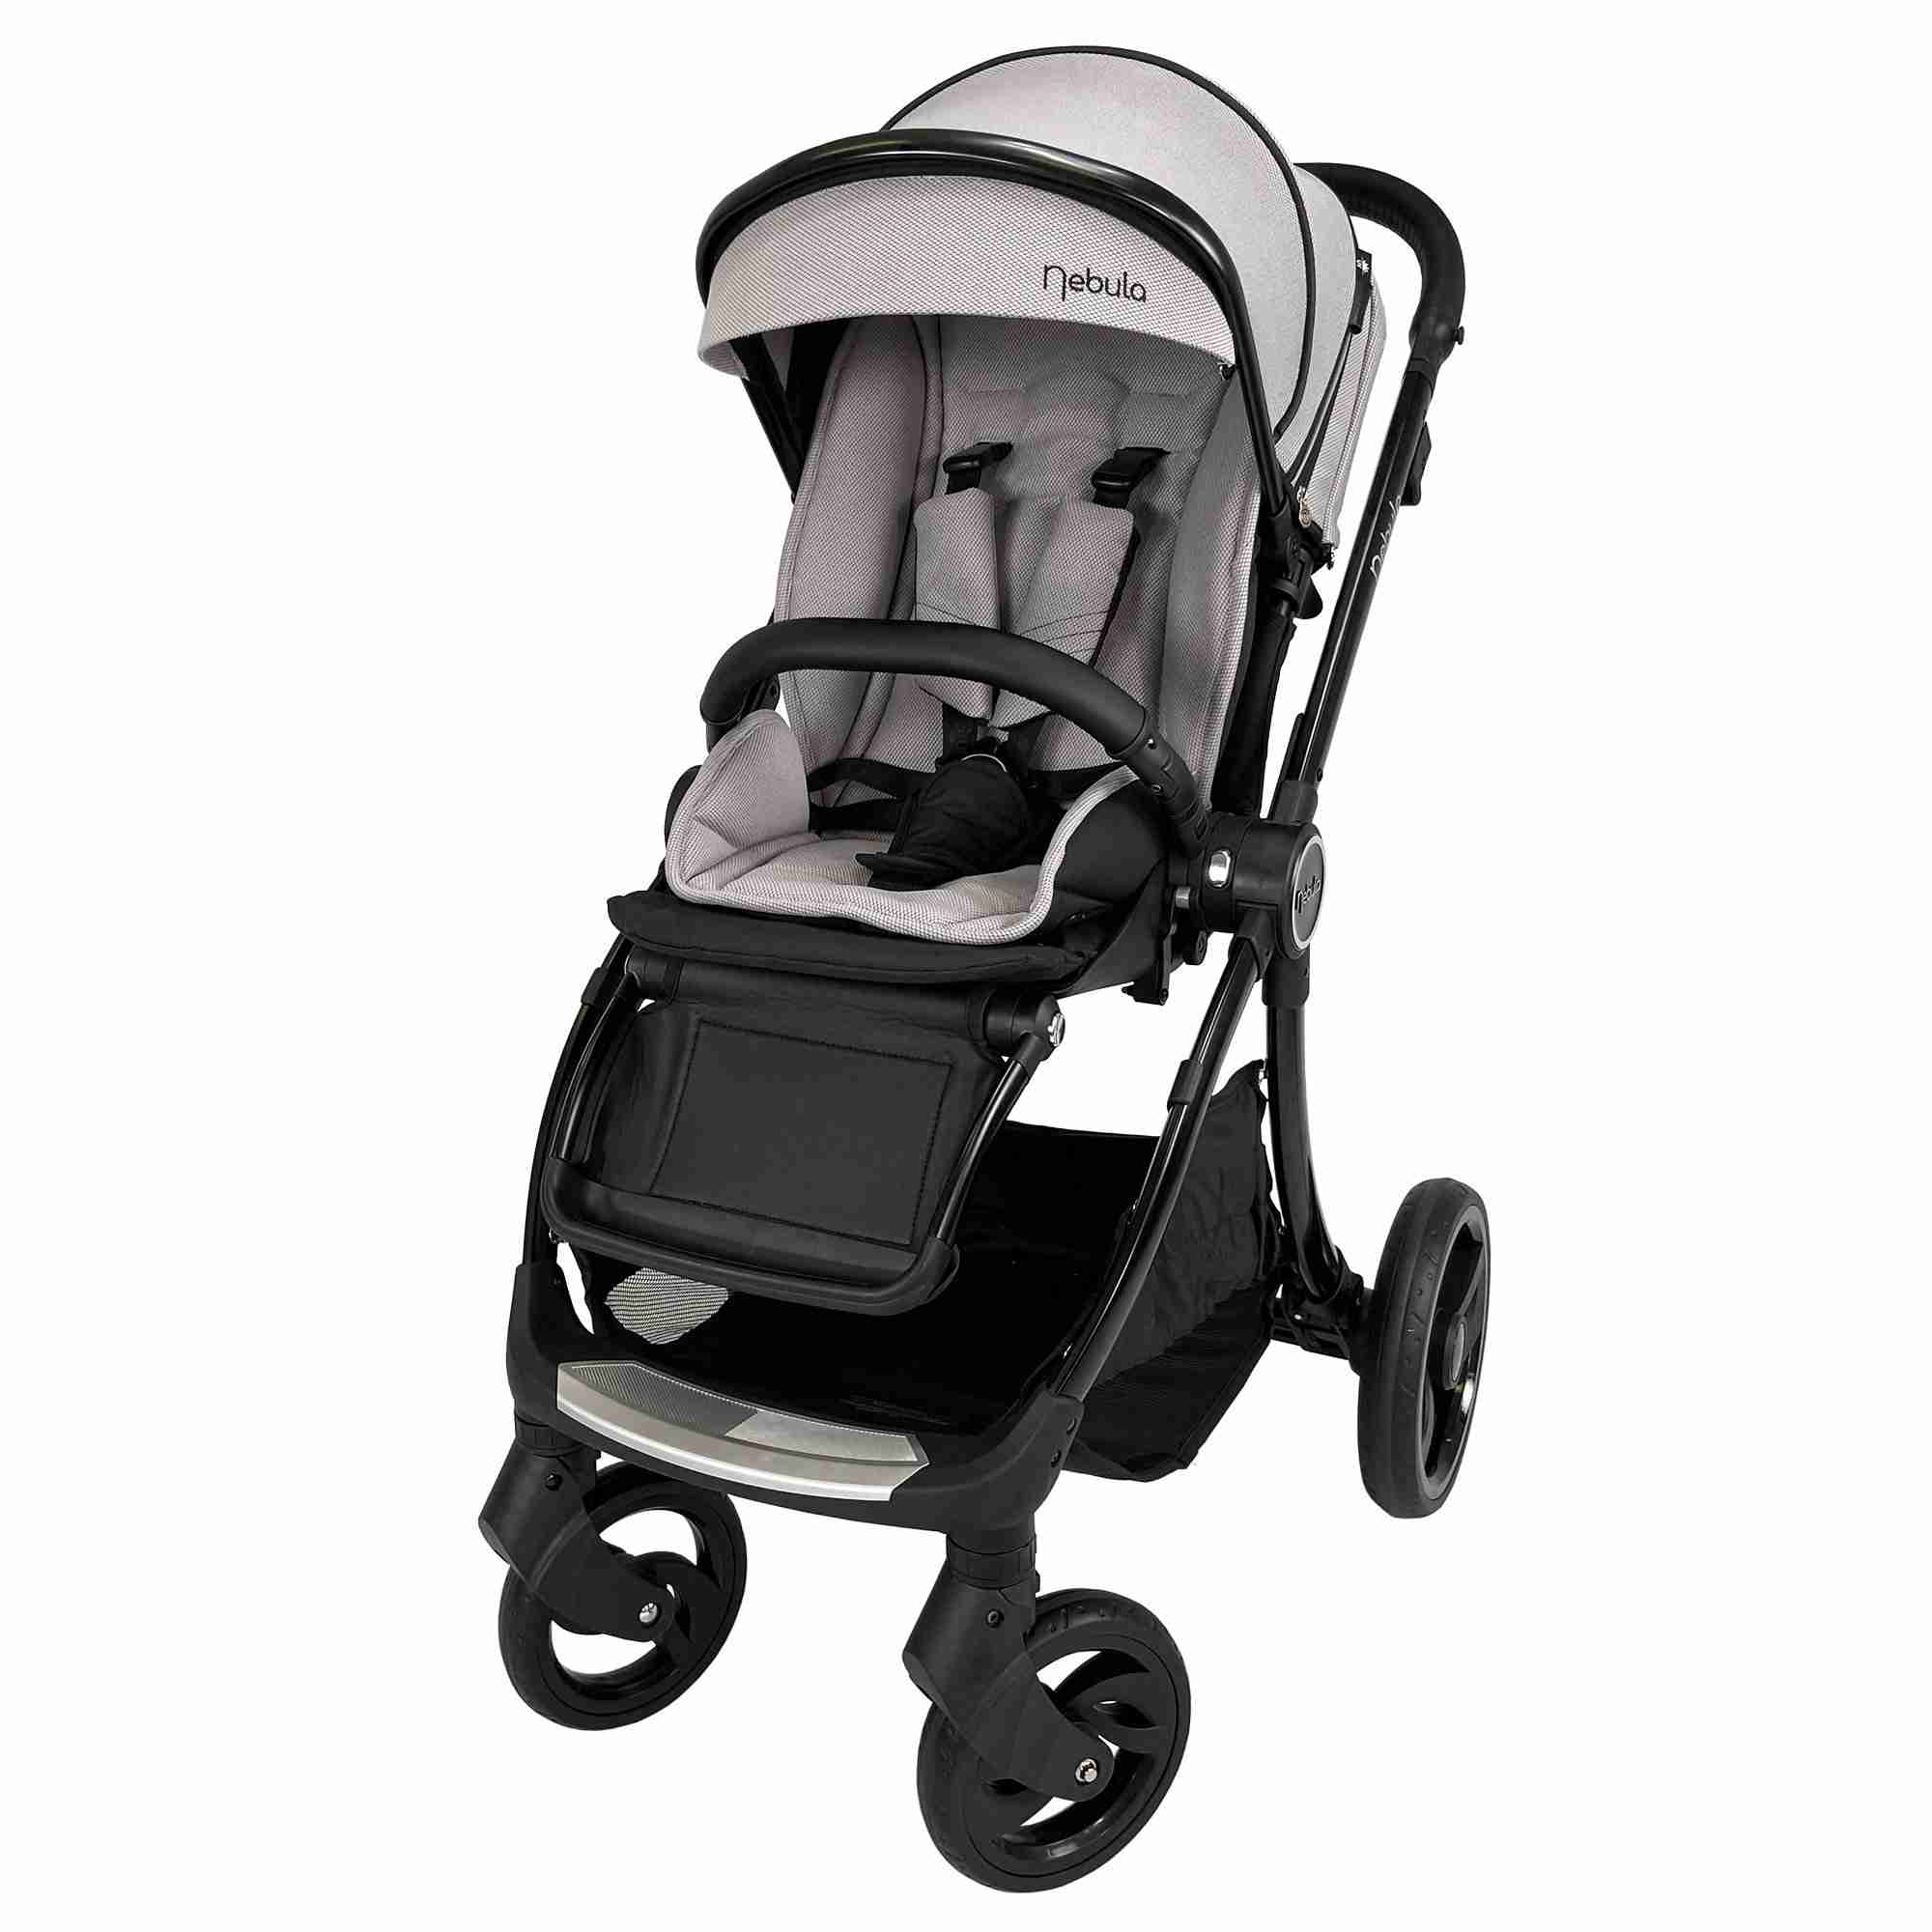 Venture Nebula Cool Grey baby stroller world facing mode